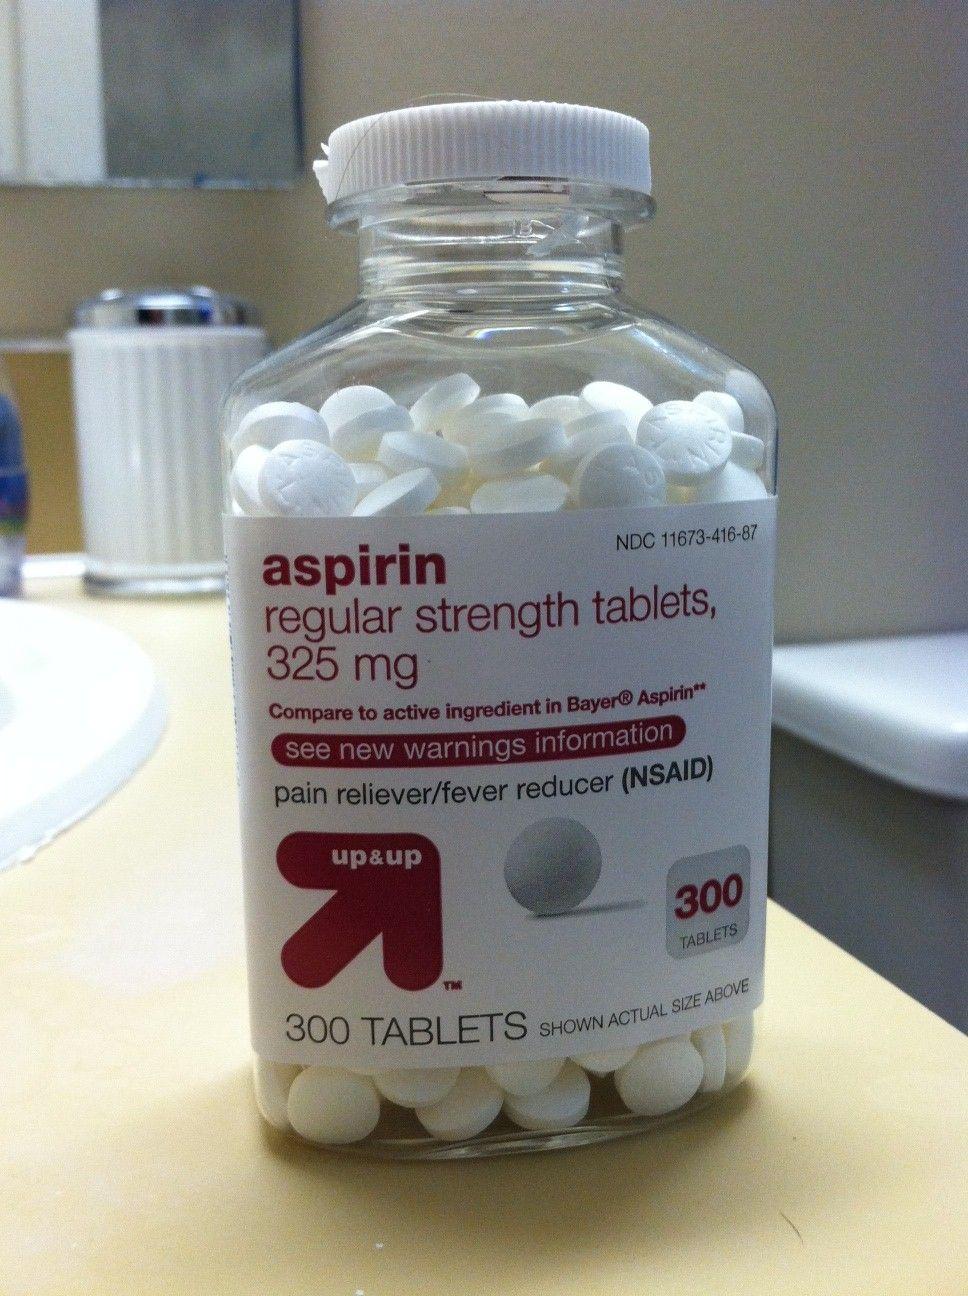 Aspirin mask for acne its simple cheap effectivethe